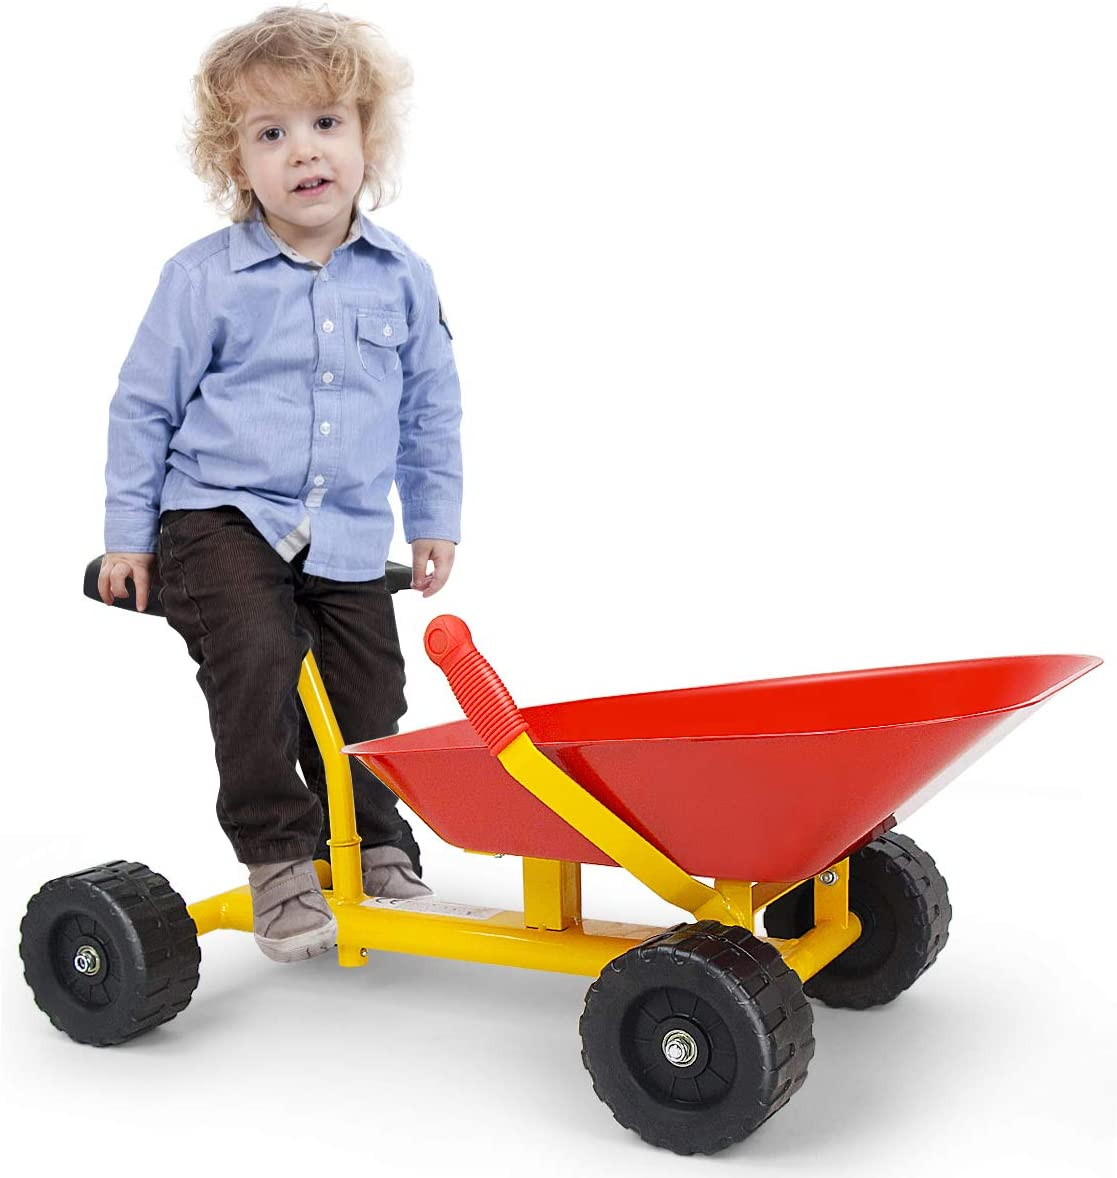 "Costzon 8"" Kids Ride-on Sand Dumper, Children Outdoor Sandbox Toy Wheelbarrow Sit On, Heavy Duty Steel Digging Scooper Excavator Crane with 4 Wheels, Metal Garden Play Tools for Boys & Girls (Red)"